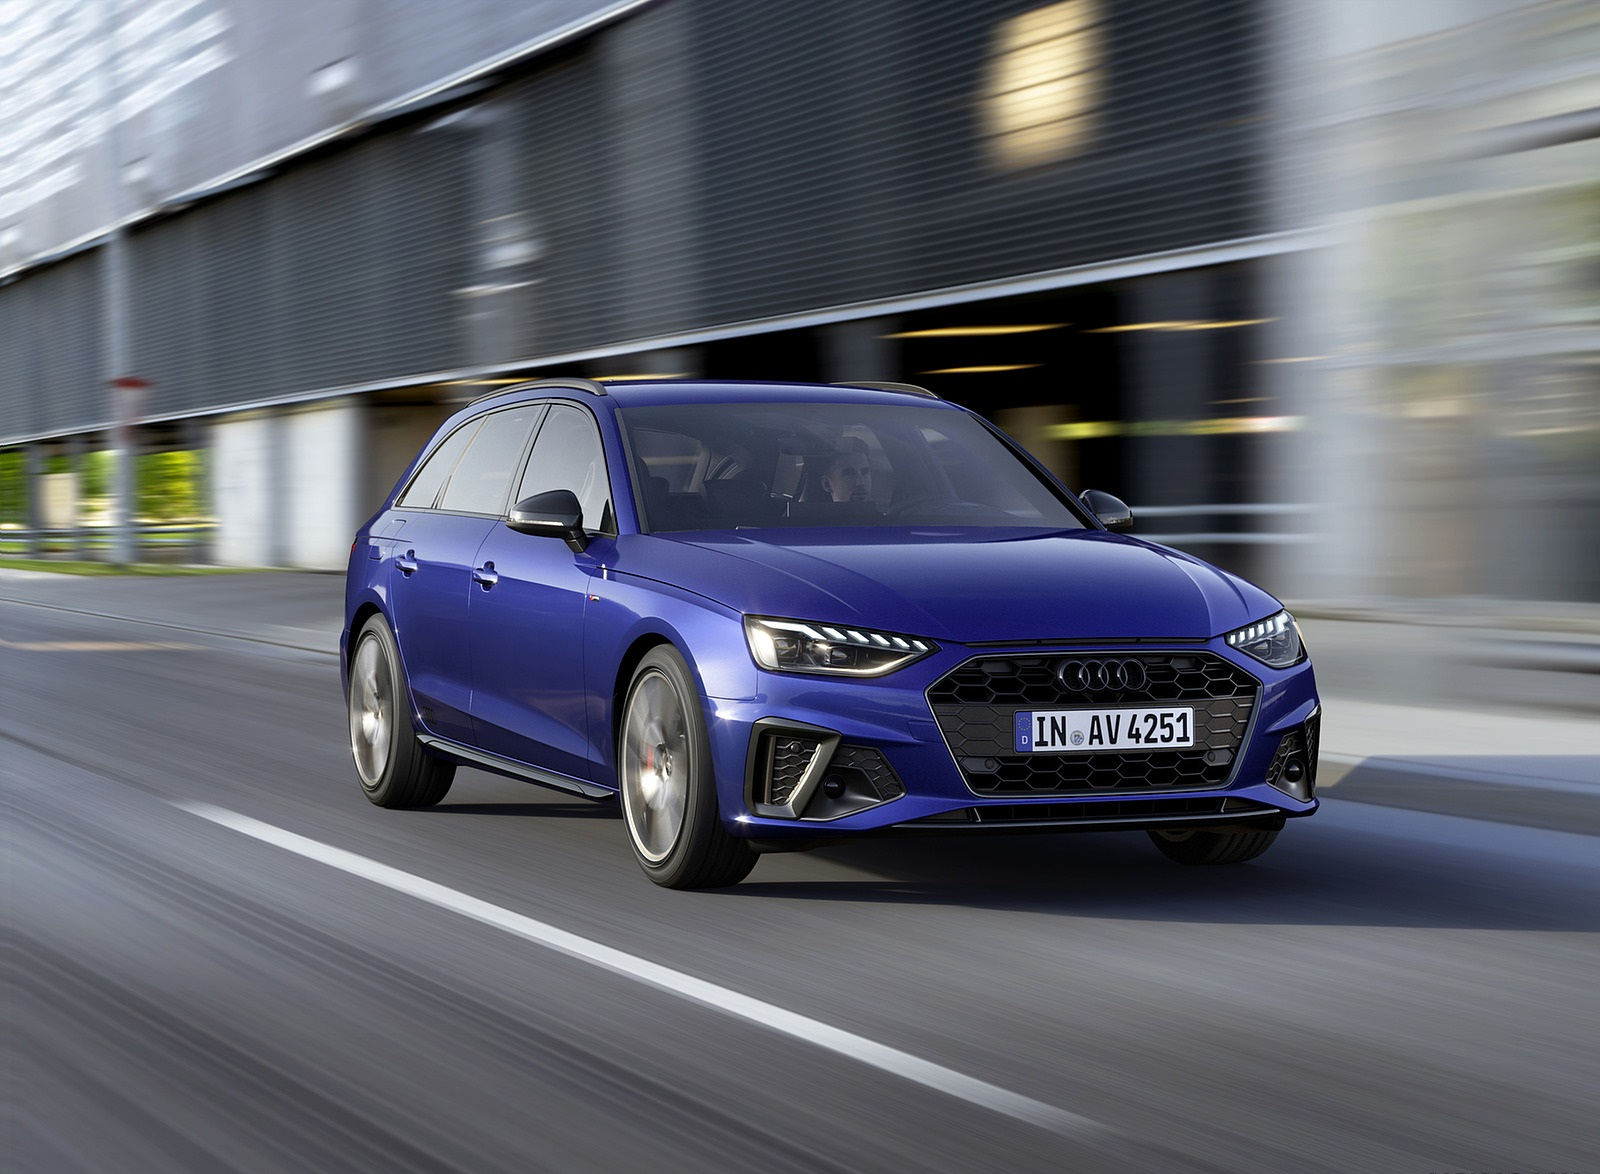 2022 Audi A4 Avant S Line Competition Plus (Color: Navarra Blue Metallic) Front Three-Quarter Wallpapers (3)